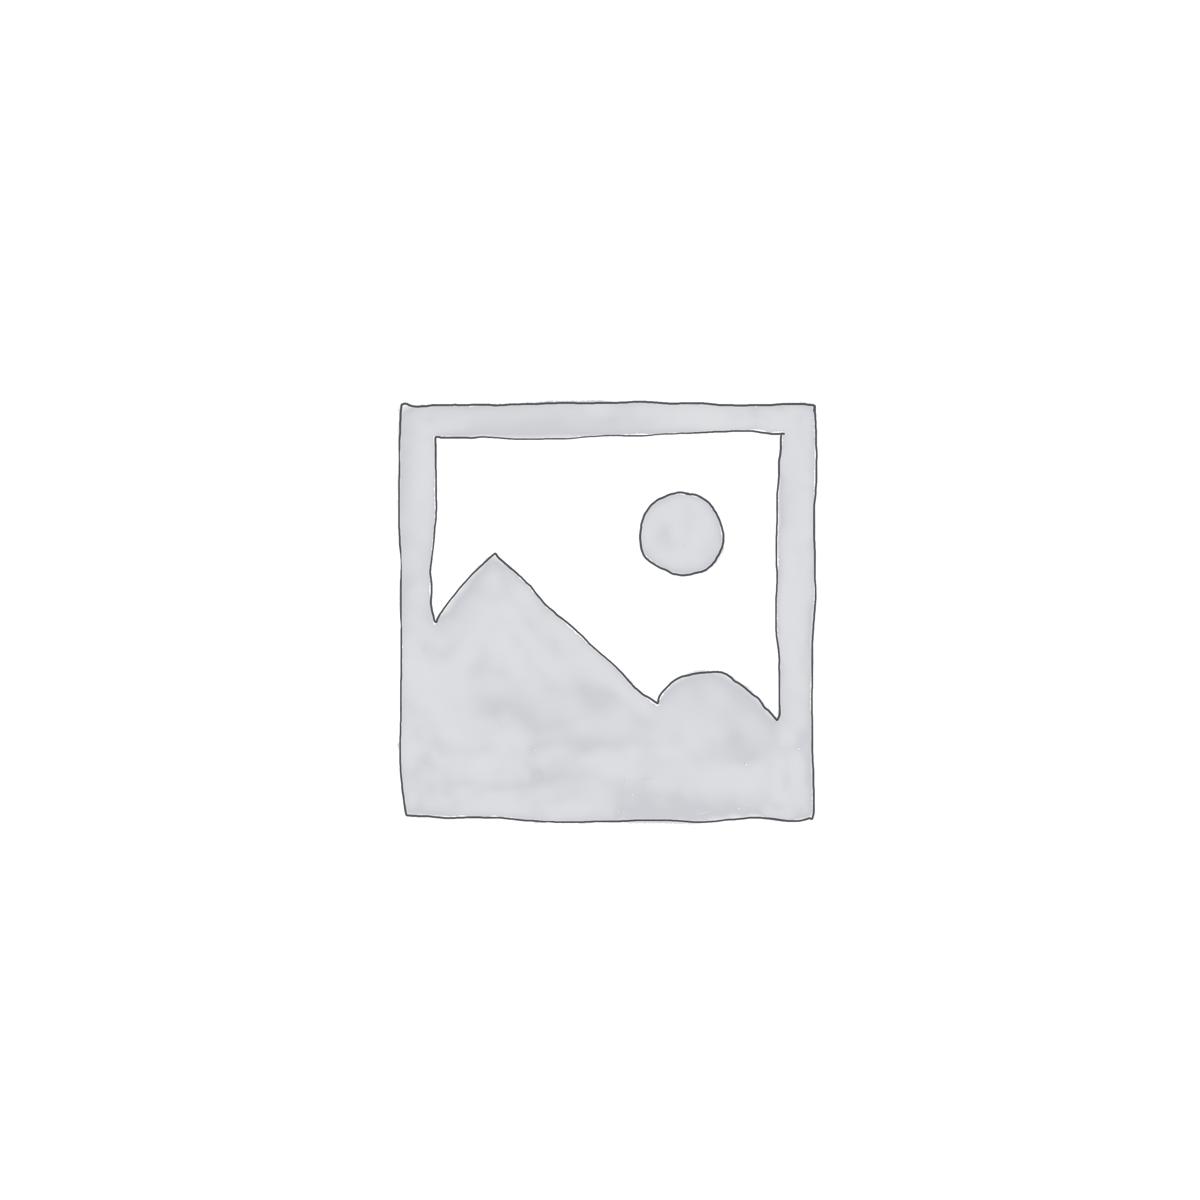 Мастербатч черный BN-03 ПЭ, Сажа HAF(N330)-20% добавки